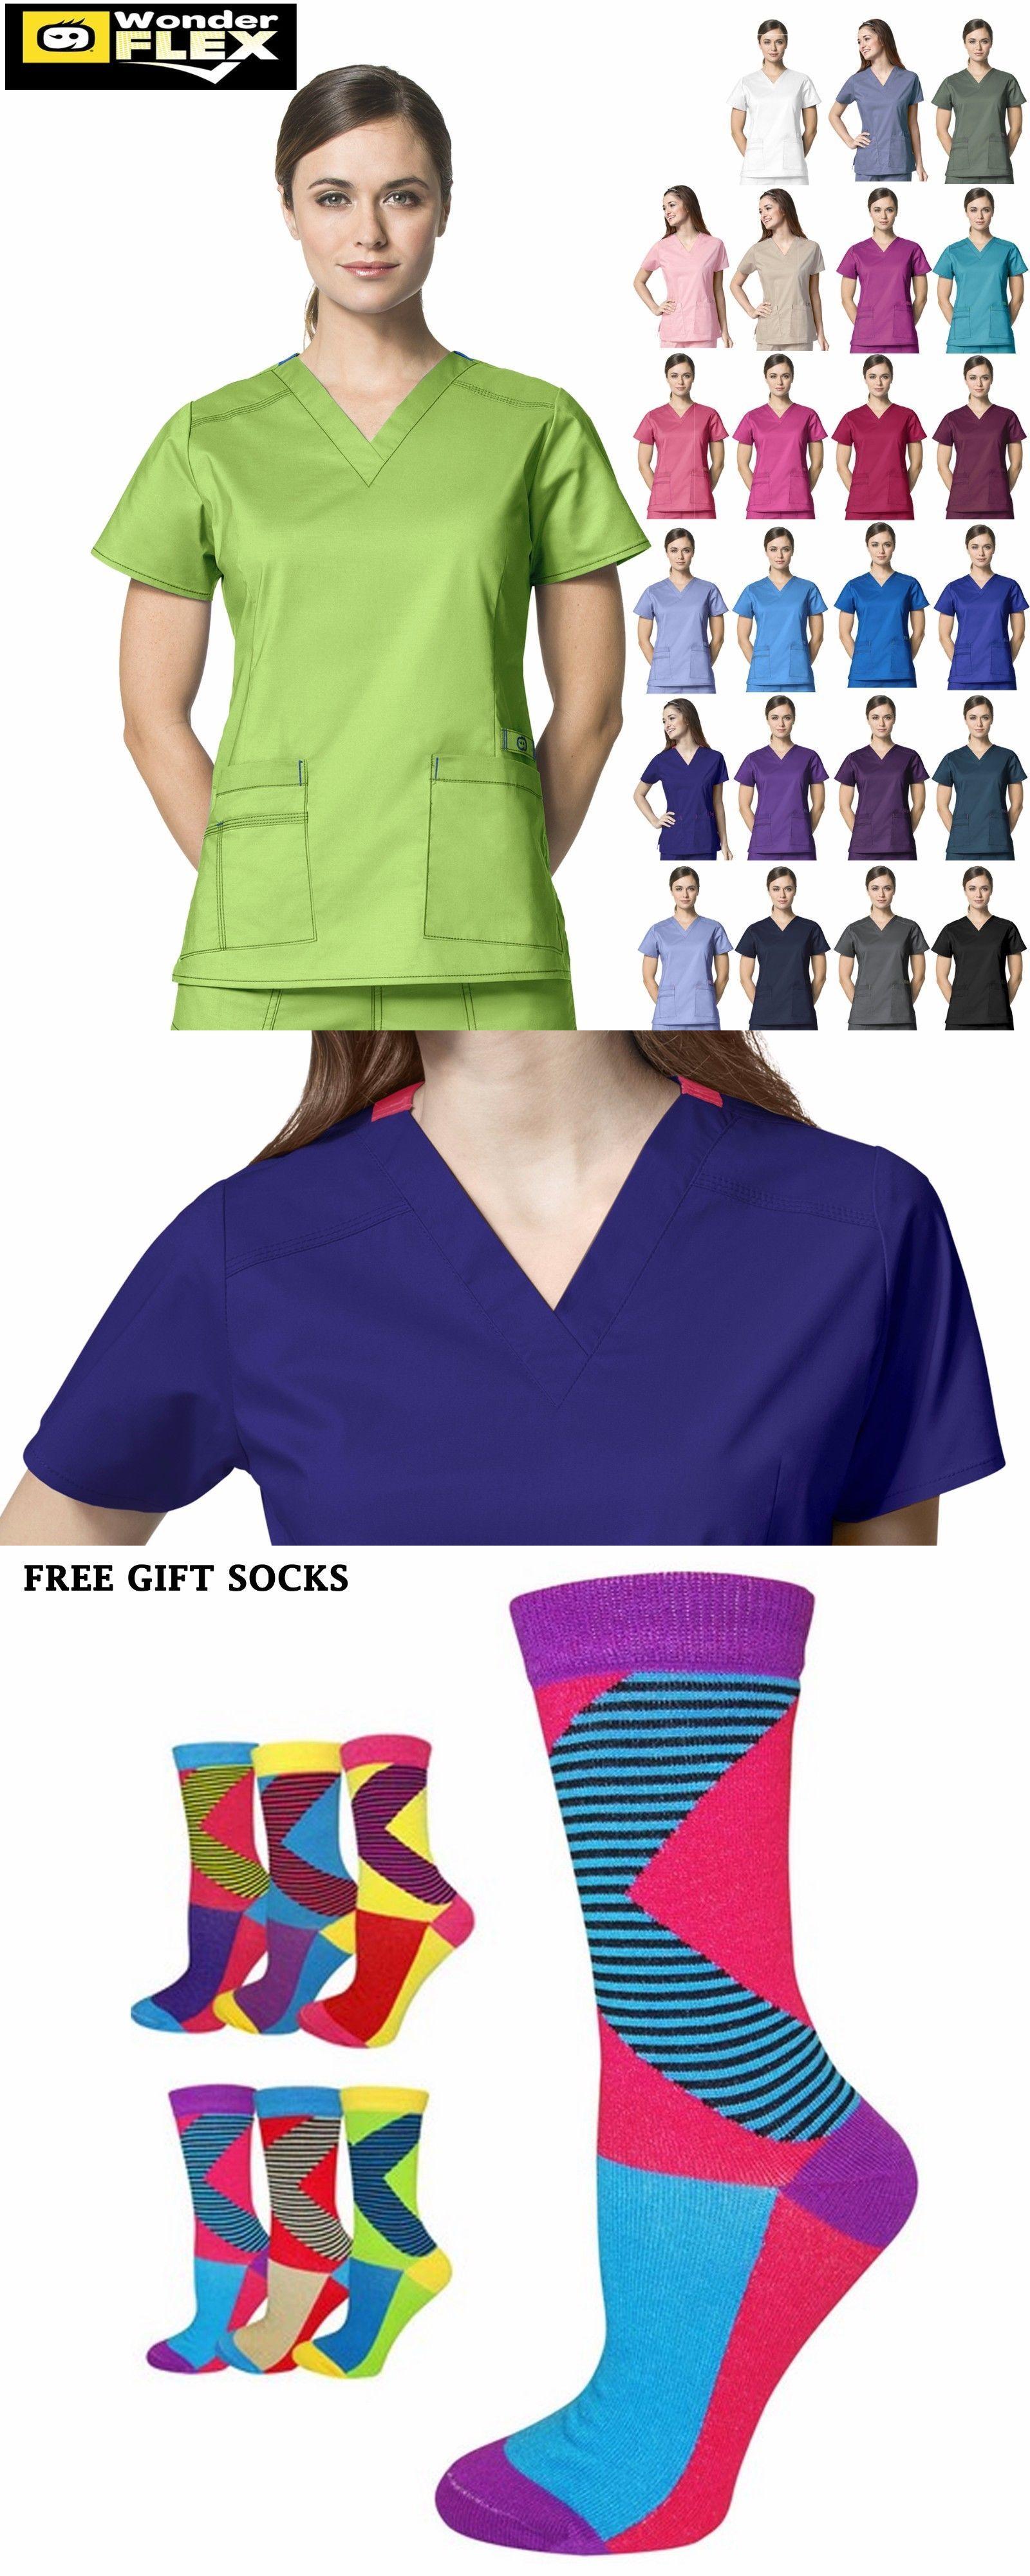 af0a602f209 Sets 105432: Wonderwink Flex [Xxs-5X] Women S V-Neck Short Sleeve Medical  Scrubs Uniforms Top -> BUY IT NOW ONLY: $23.98 on #eBay #wonderwink #women  #short ...